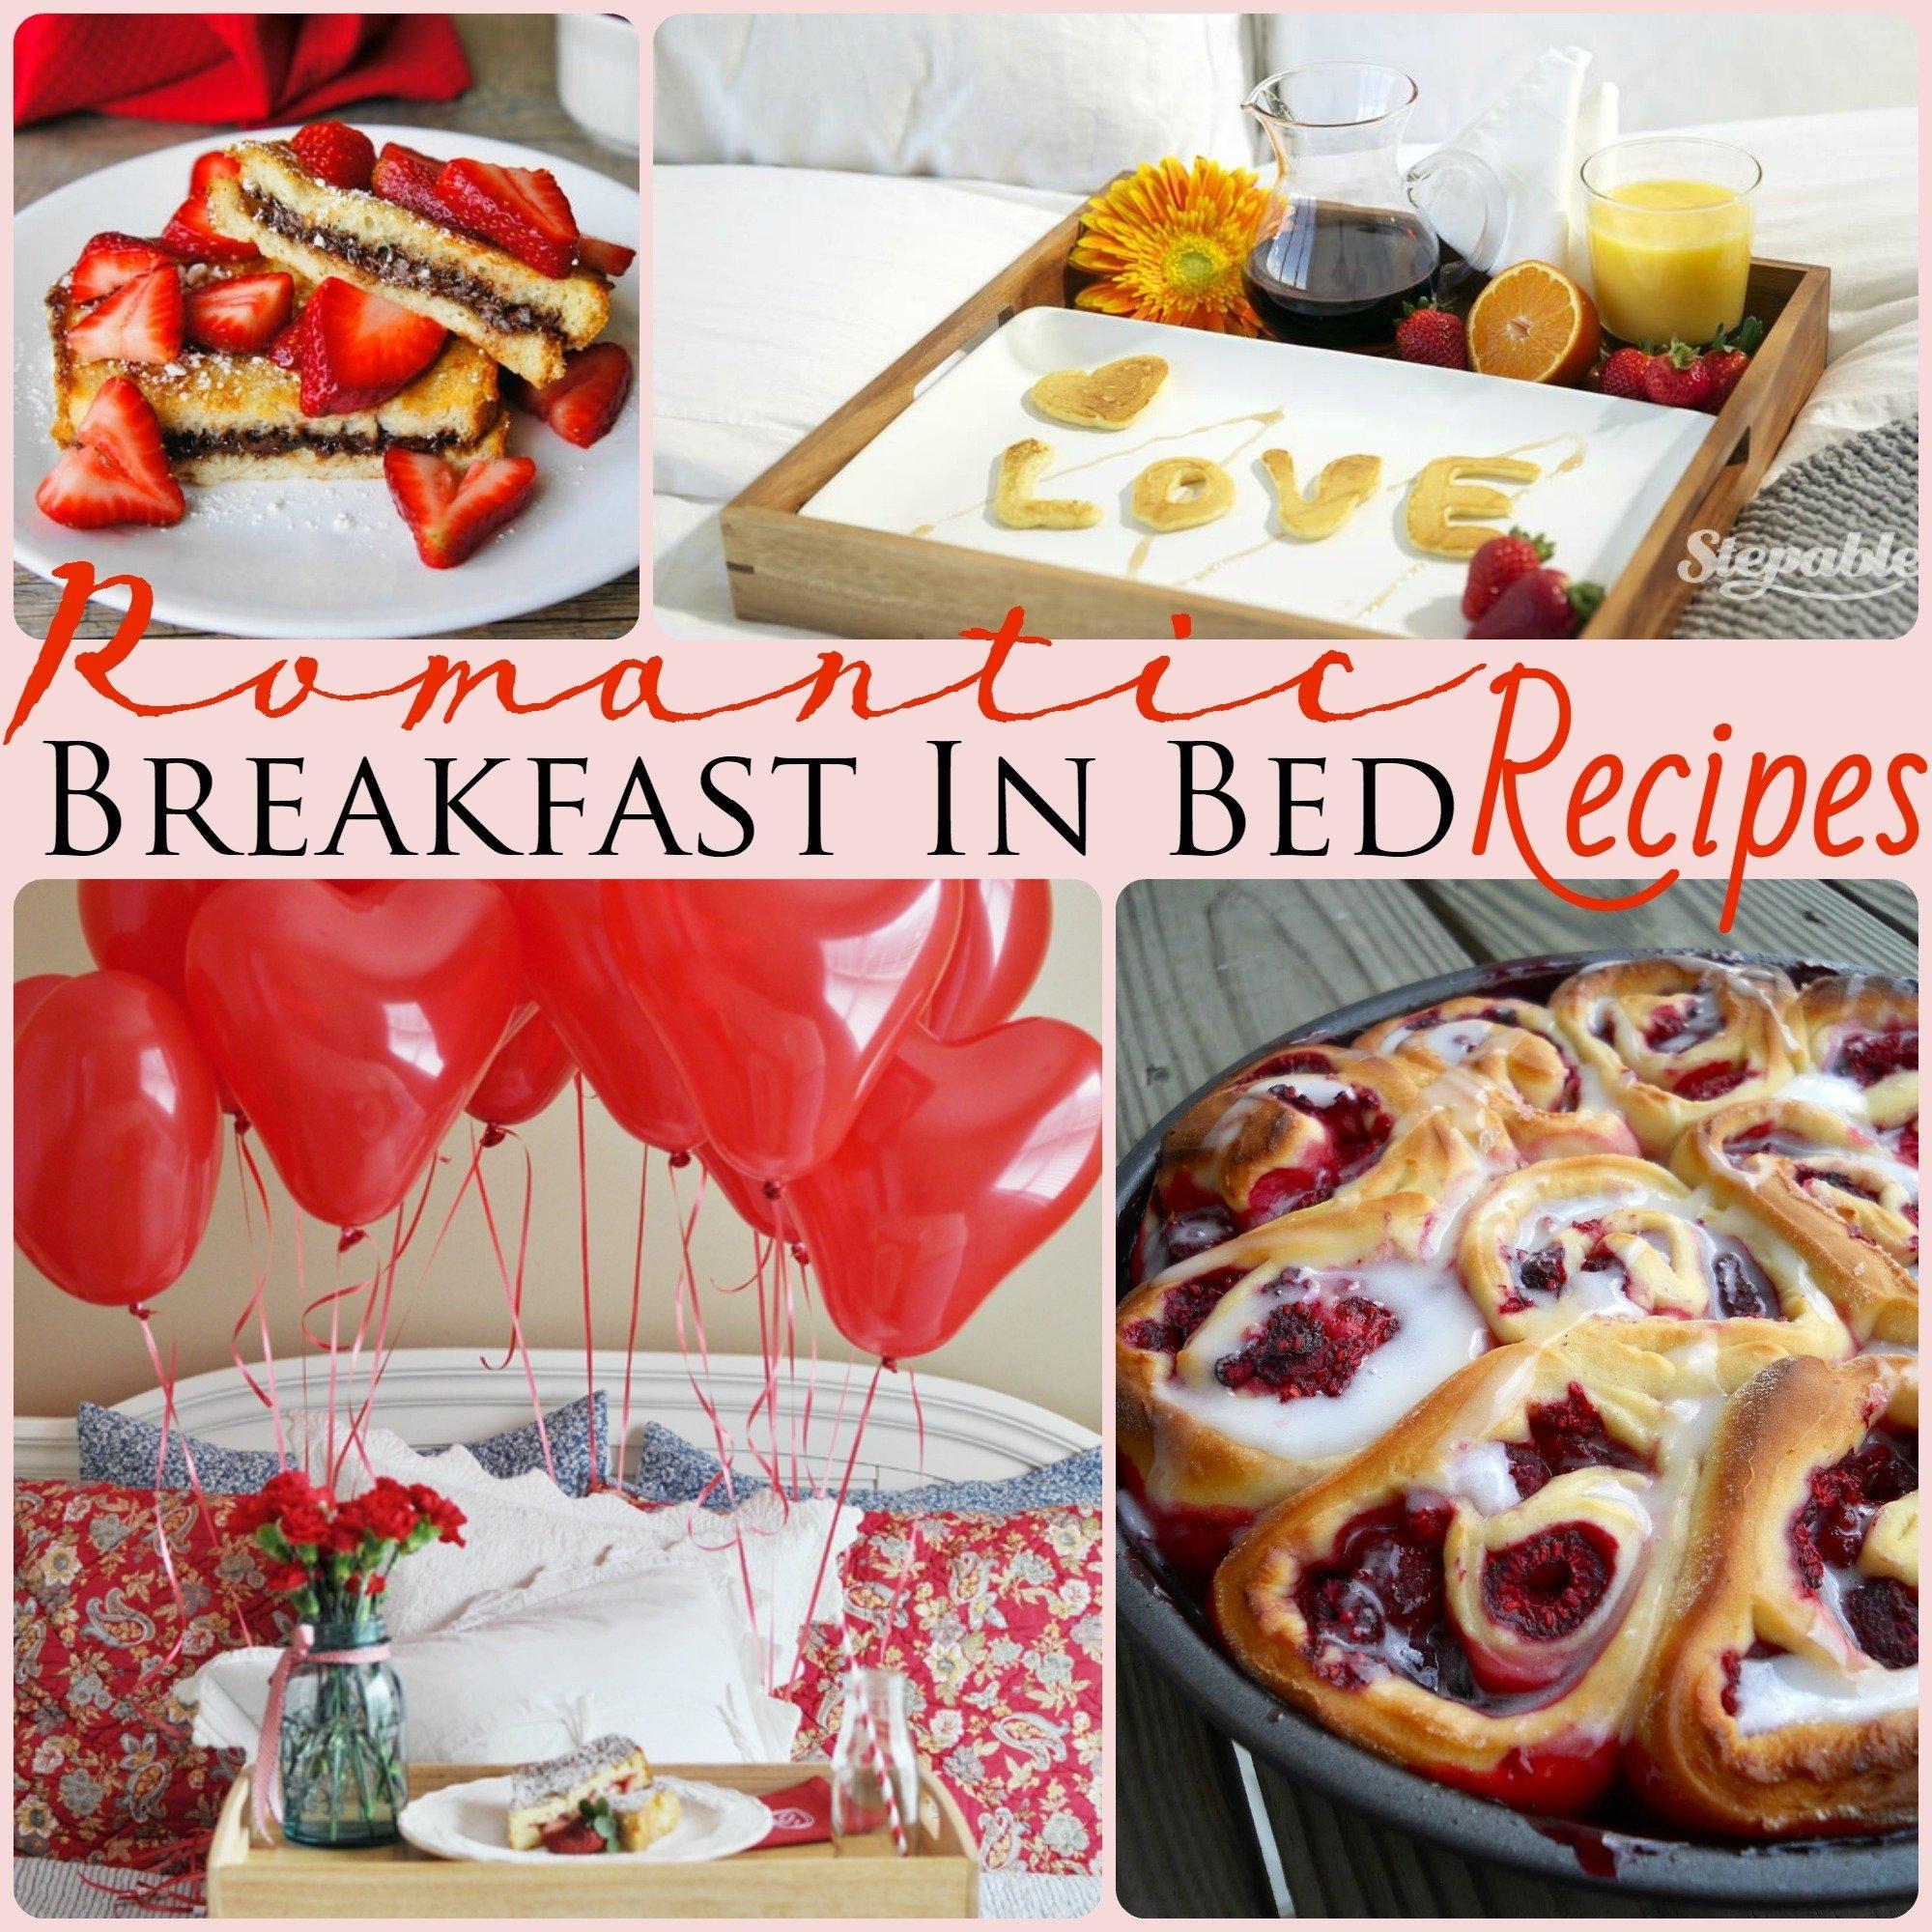 10 Gorgeous Romantic Breakfast In Bed Ideas 21 romantic breakfast in bed recipes piece of home 1